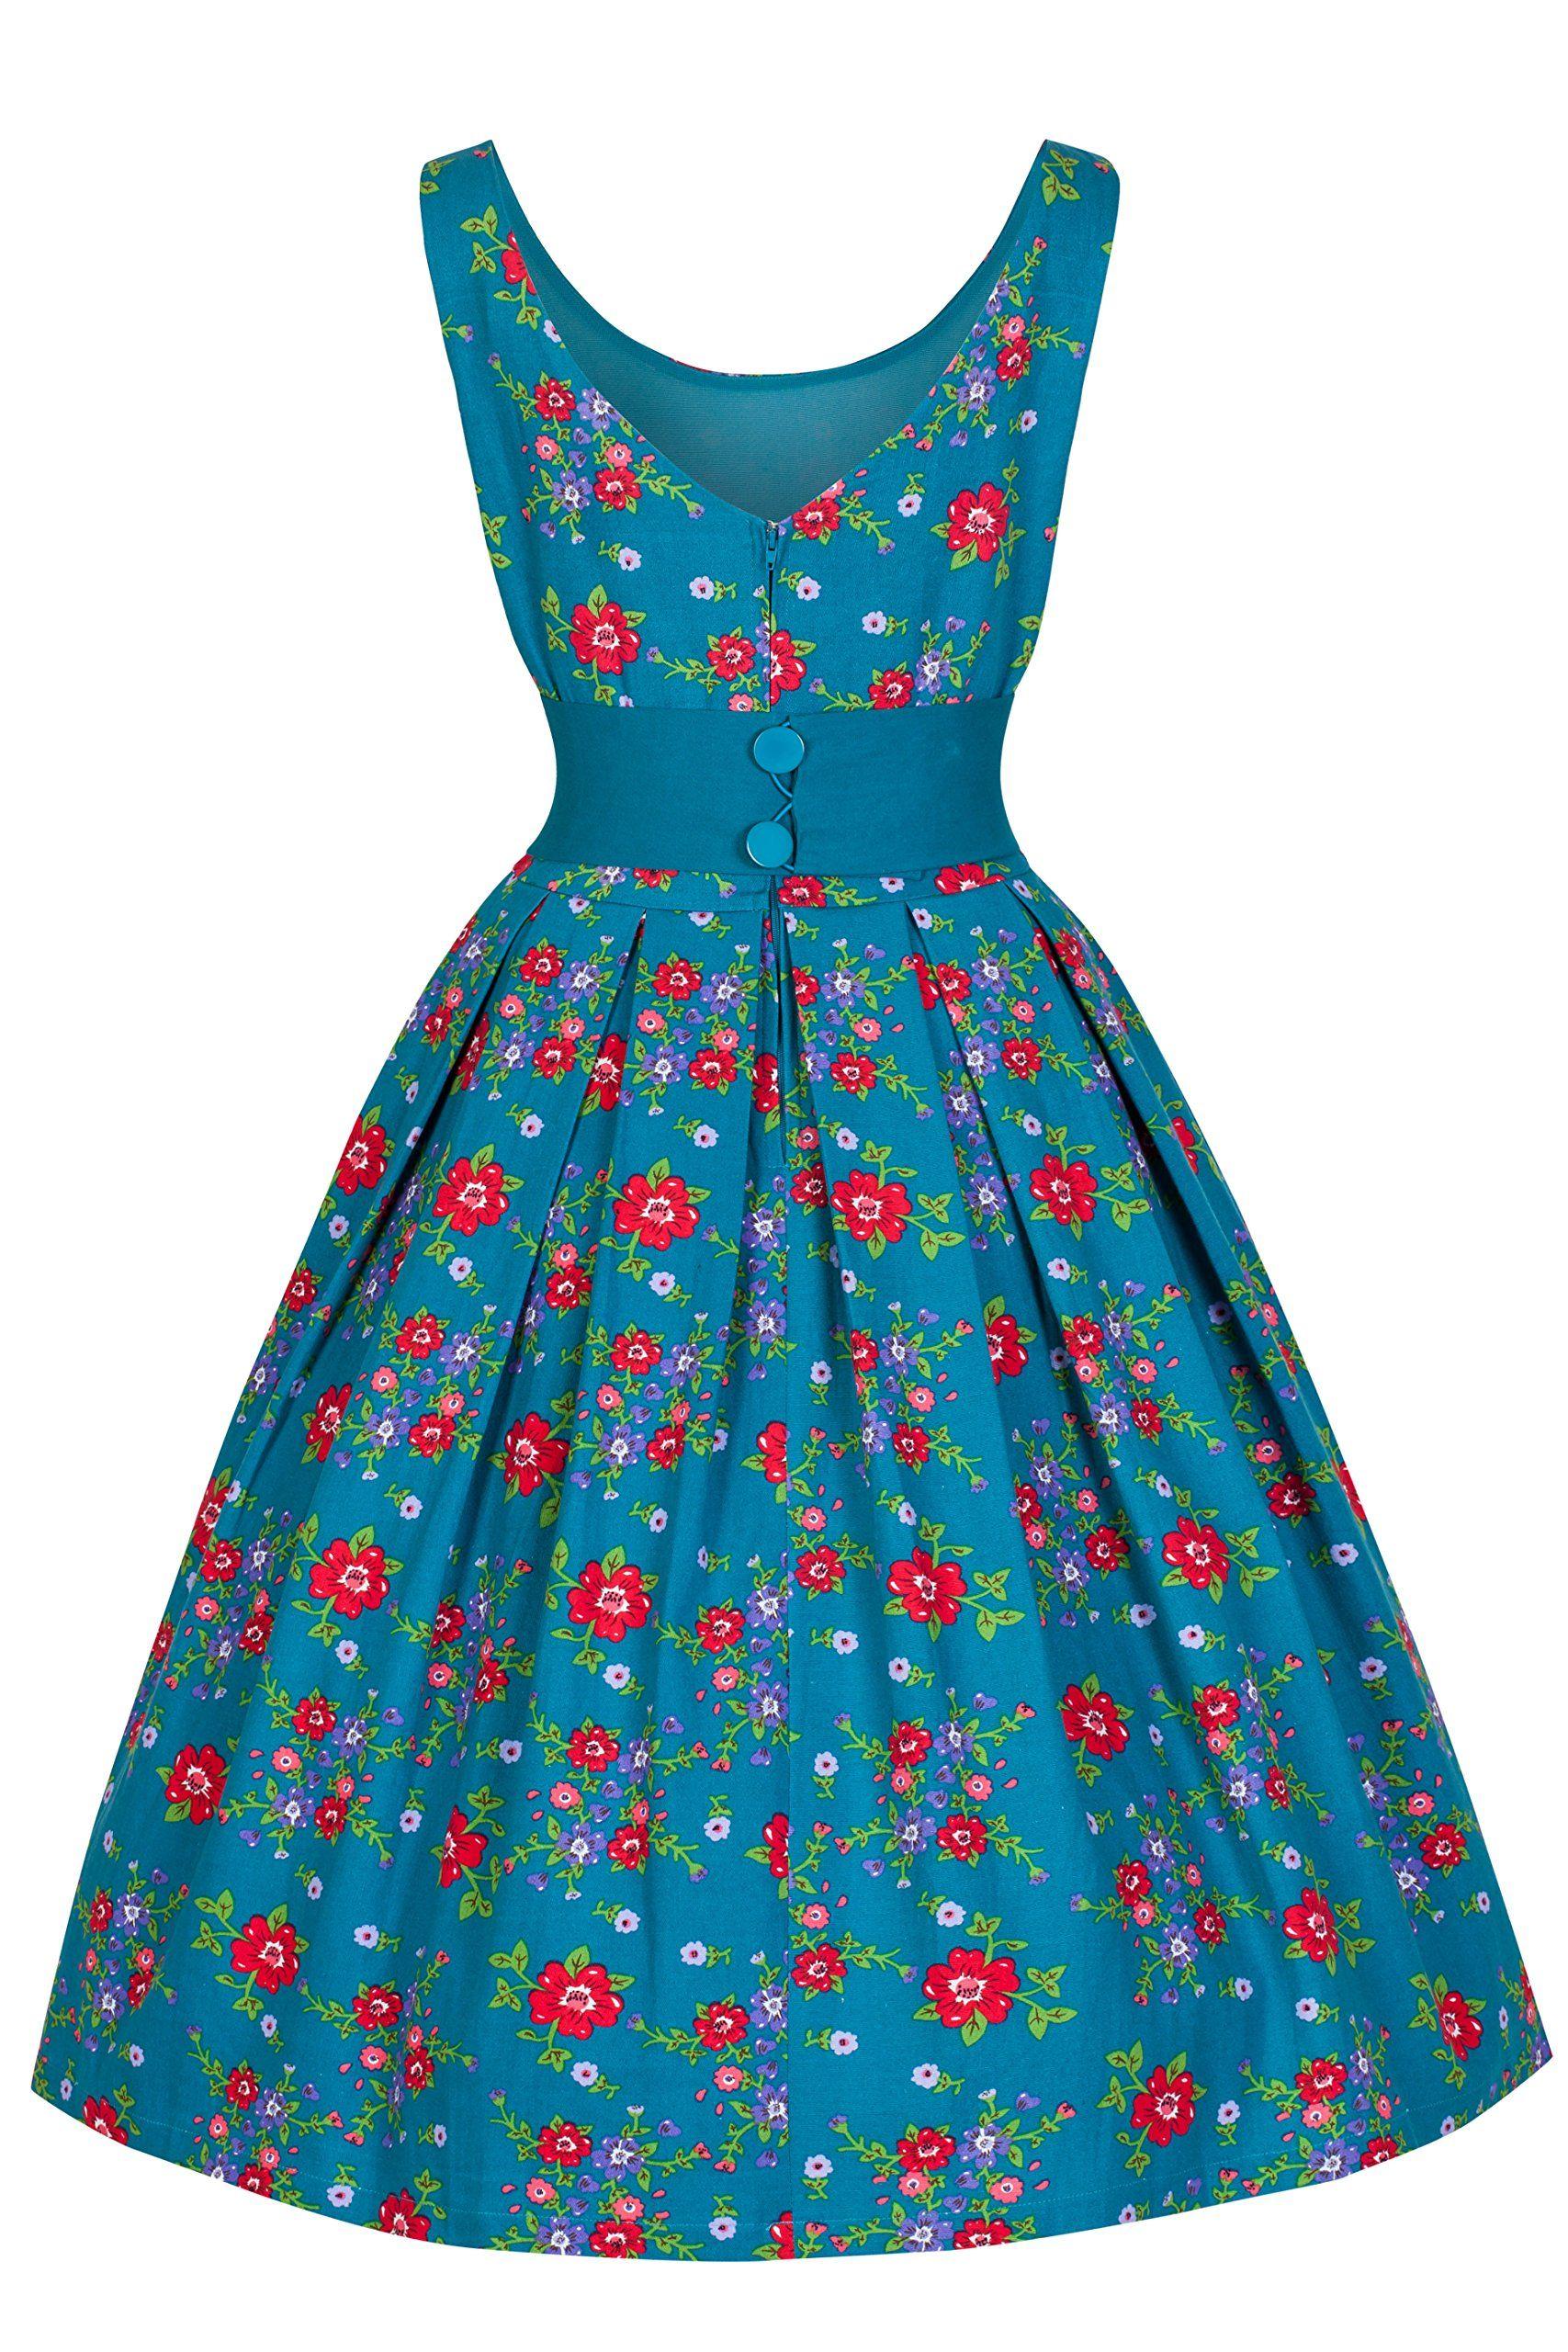 Lindy Bop \'Lana\' Elegant Vintage 1950\'s Garden Party Prom Dress (M ...